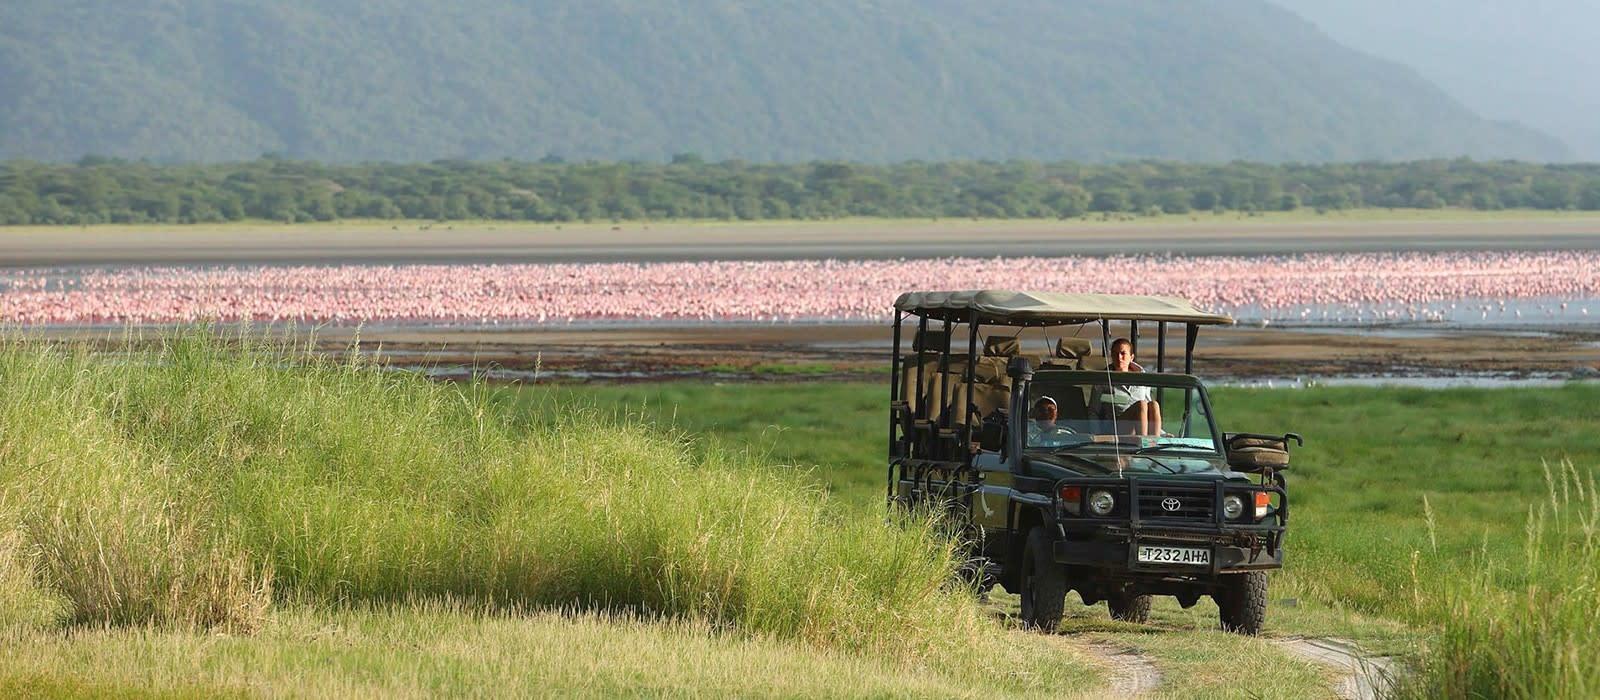 Destination Manyara and Ngorongoro Tanzania